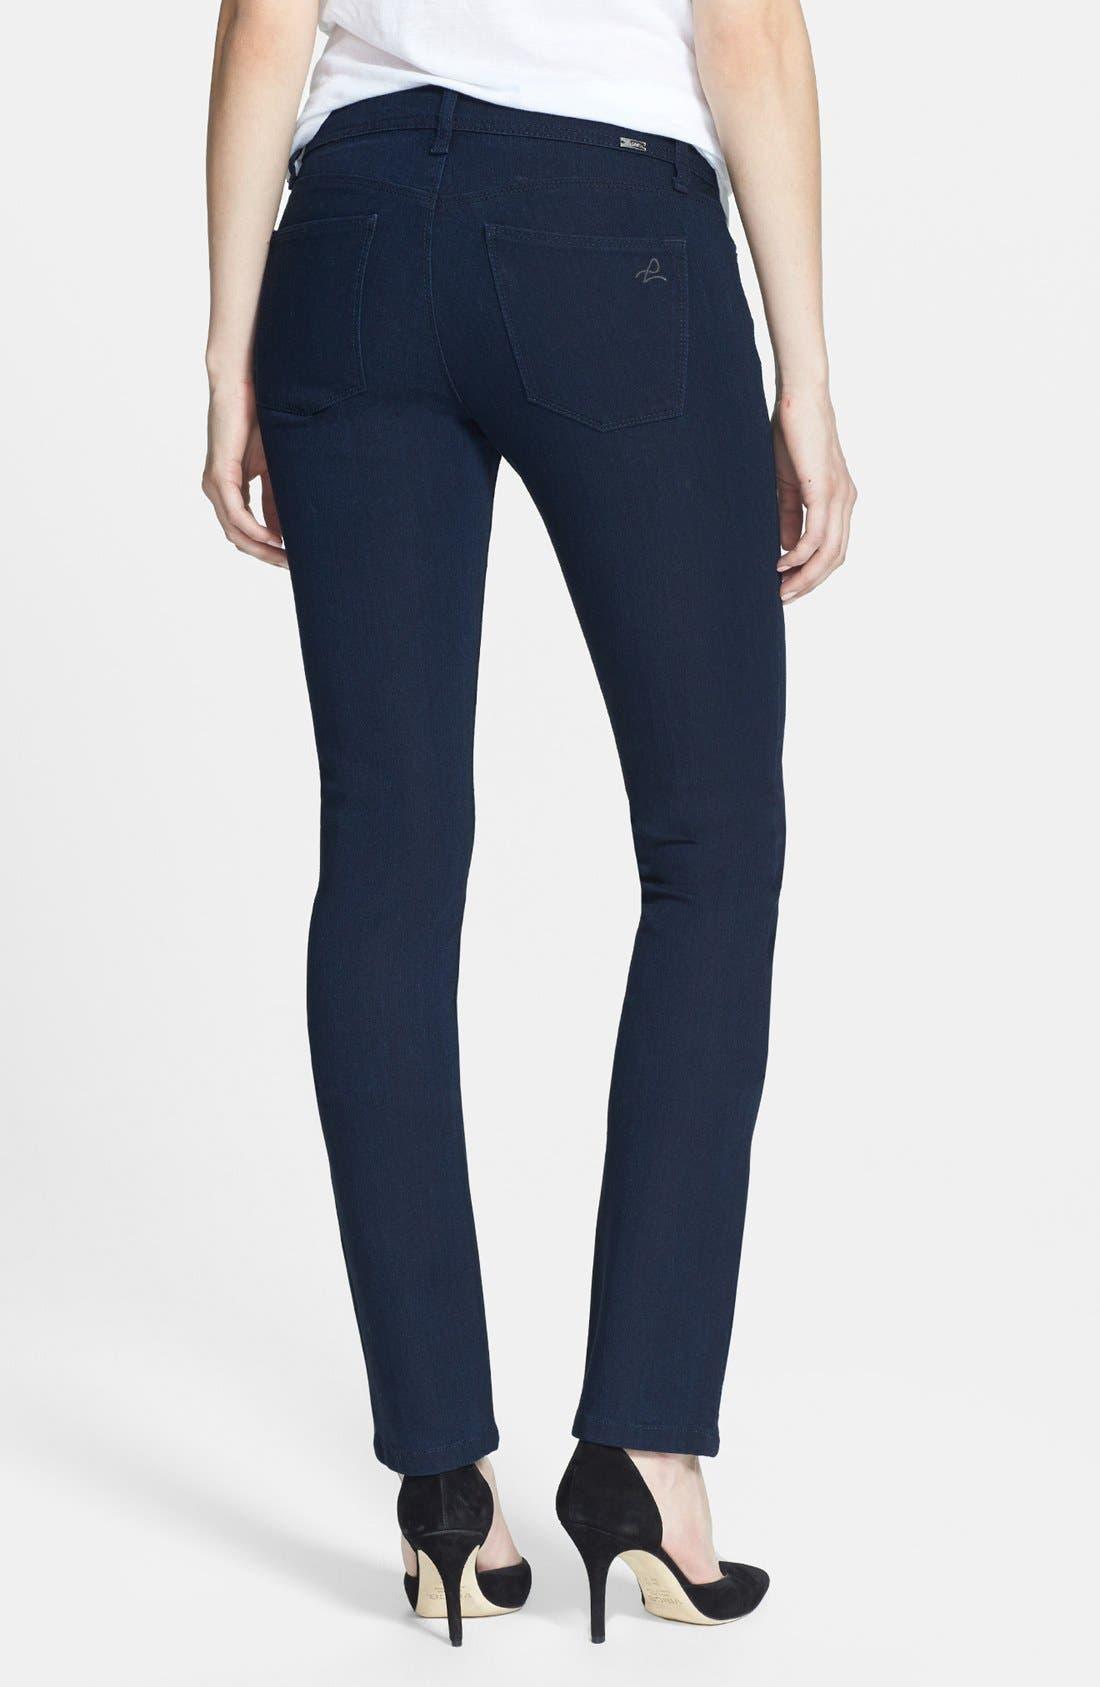 Alternate Image 2  - DL1961 'Coco' Curvy Straight Jeans (Flatiron)